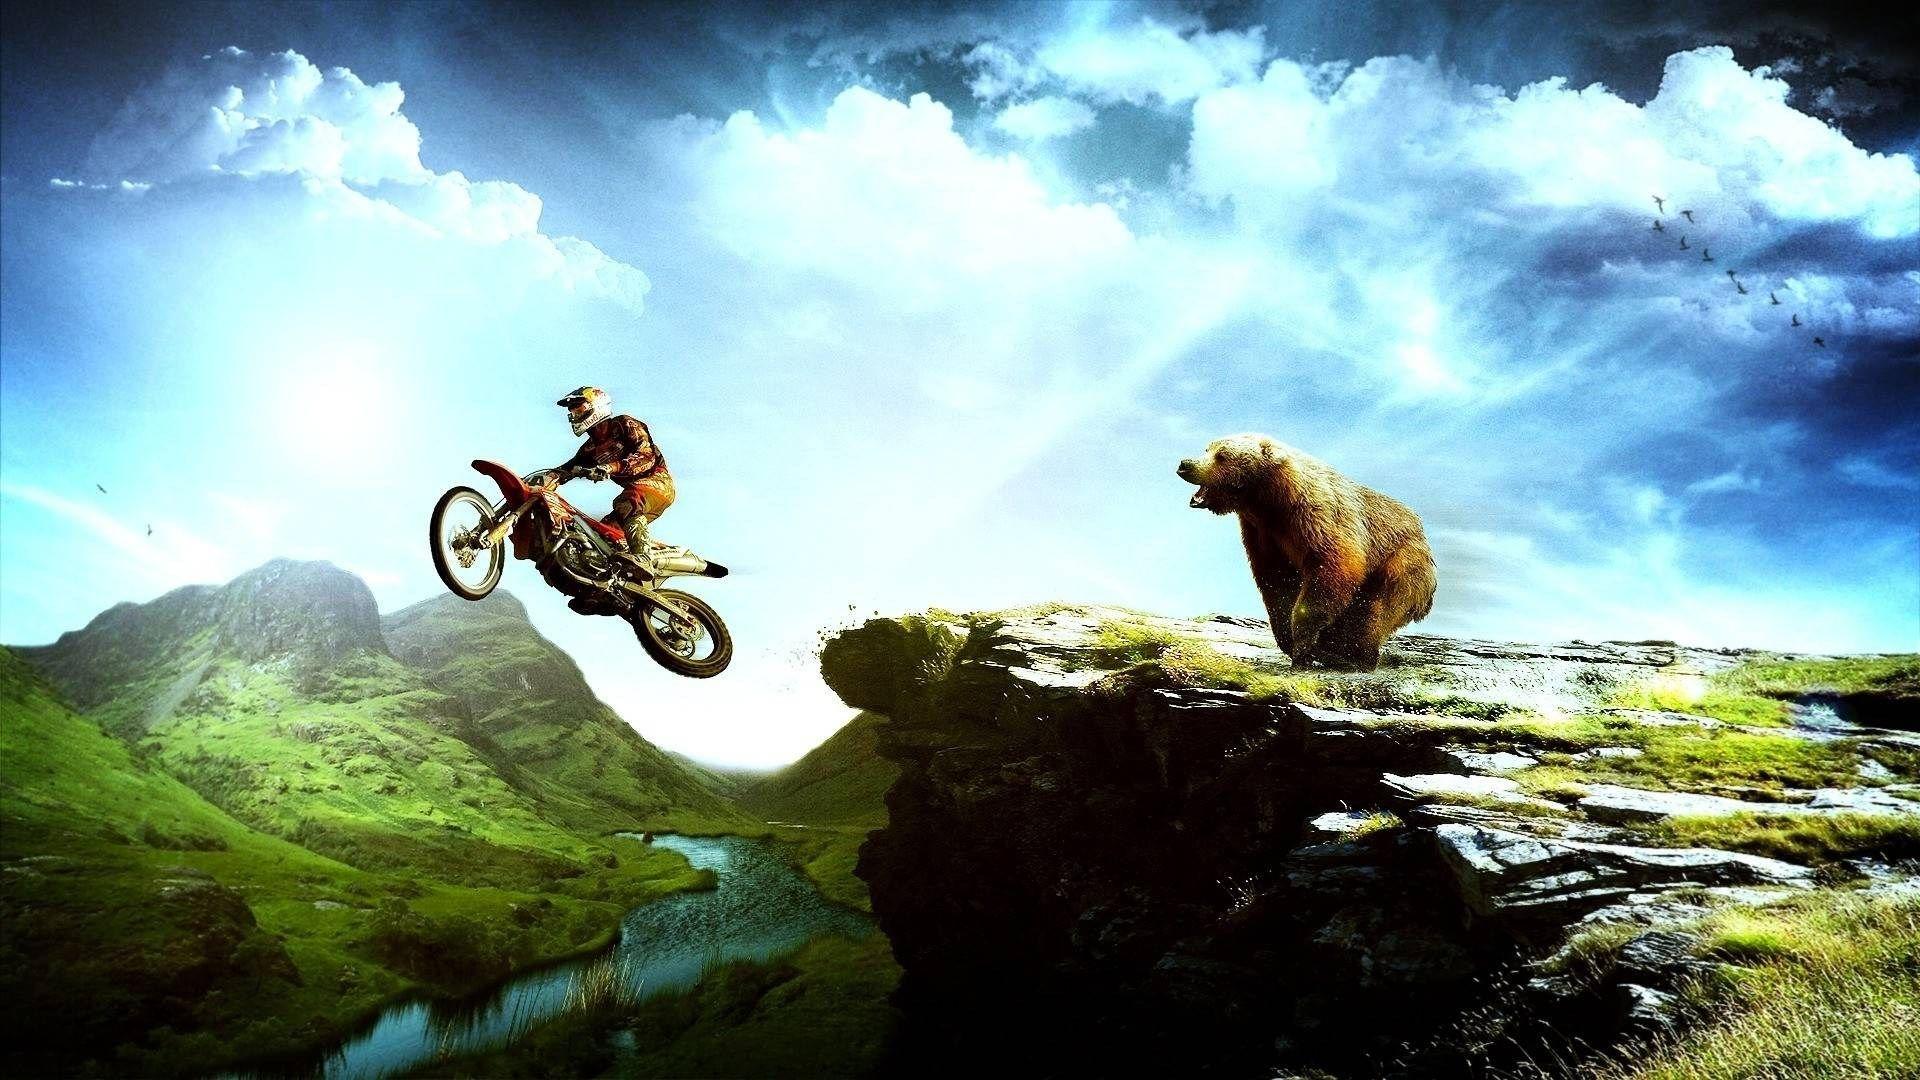 dirt bike wallpaper for desktop background 269 kB Hansford